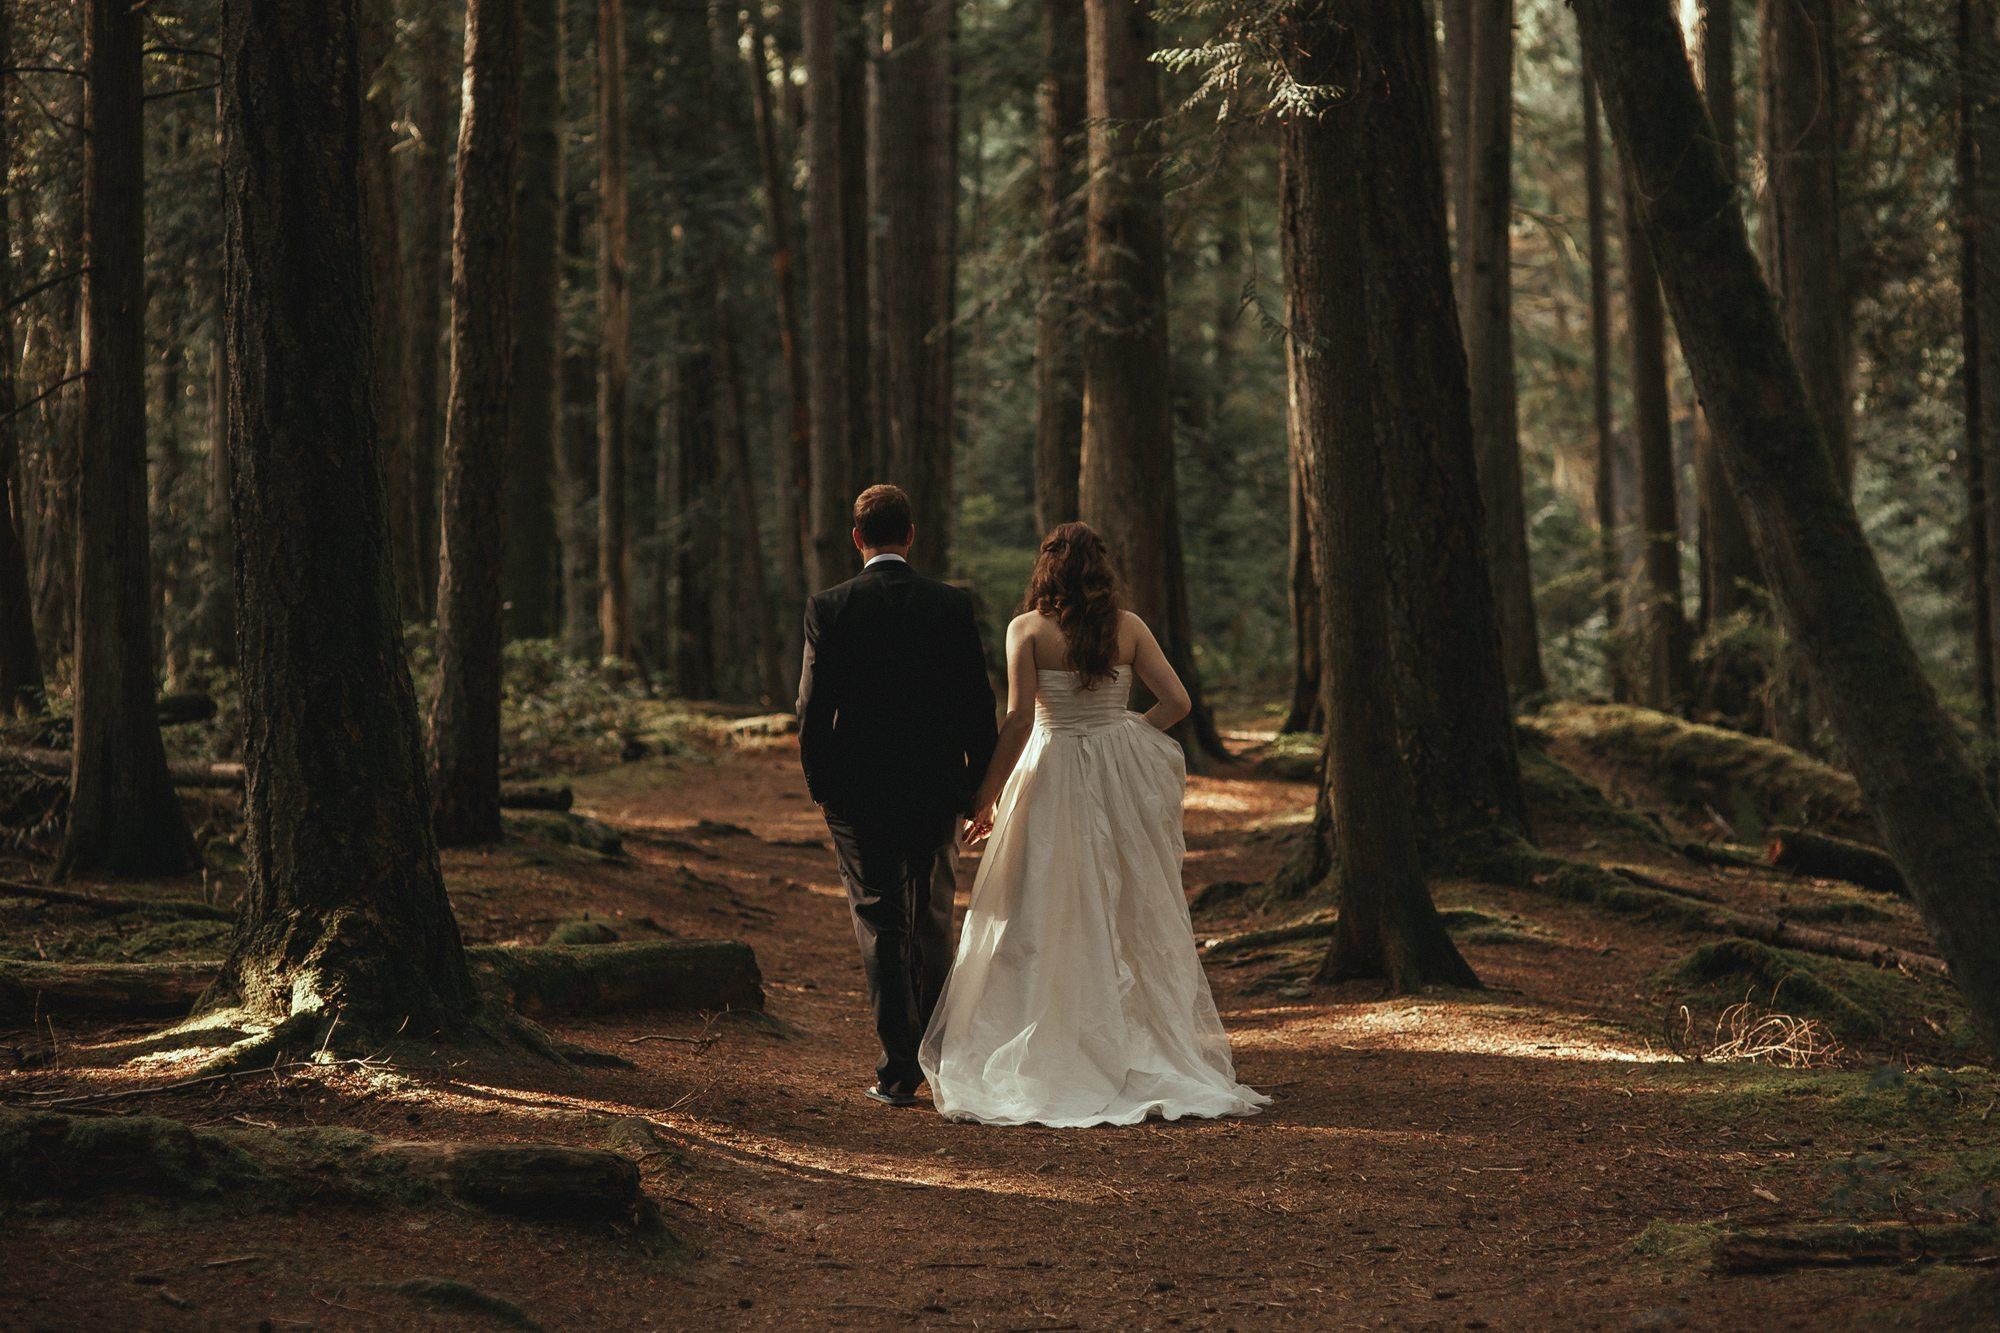 gibsons-wedding-photography-robert-devon33